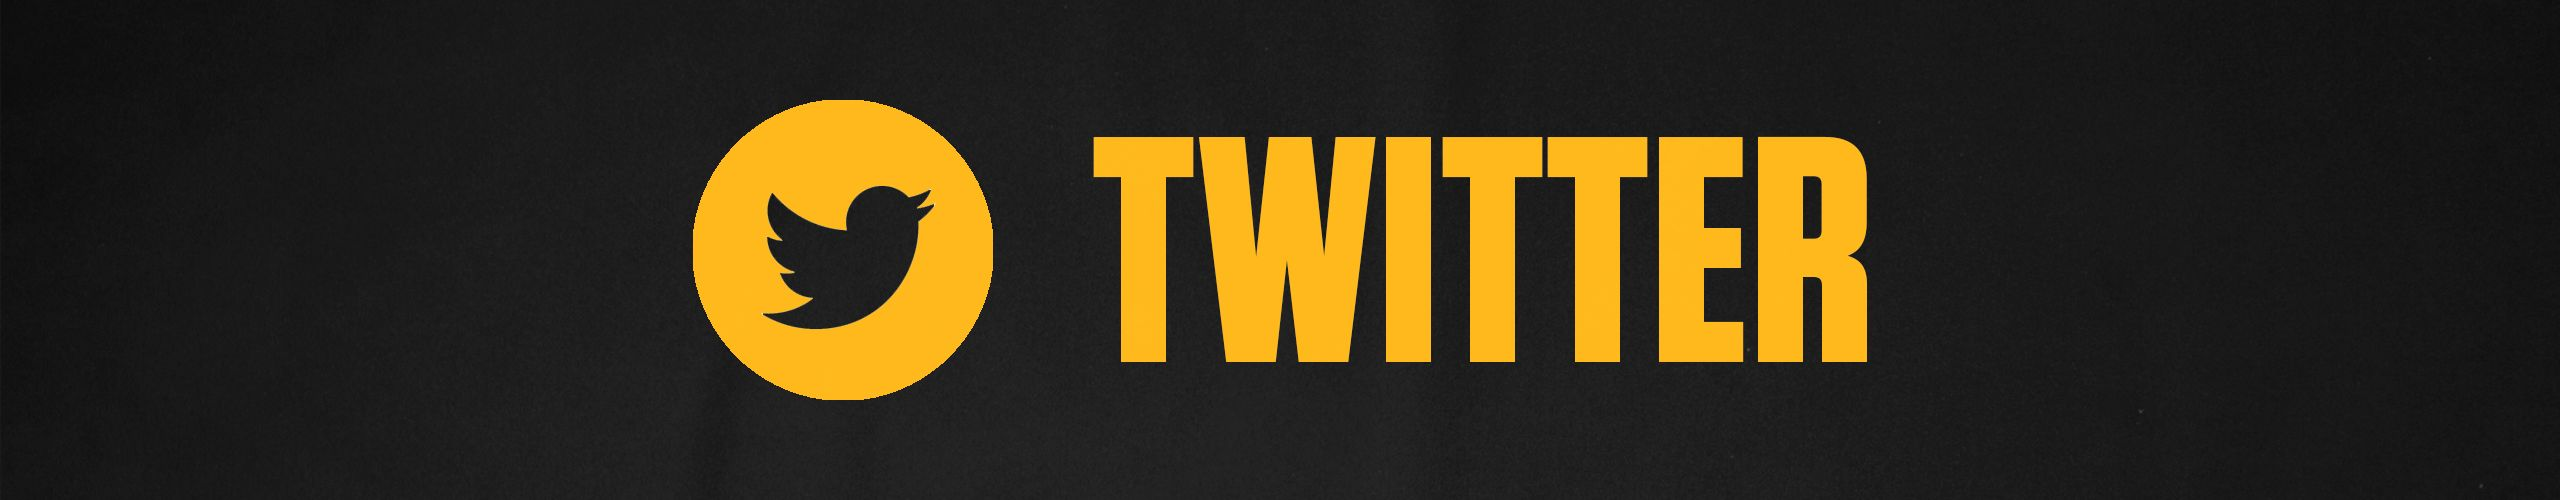 W-Twitter-2560x500-Badge